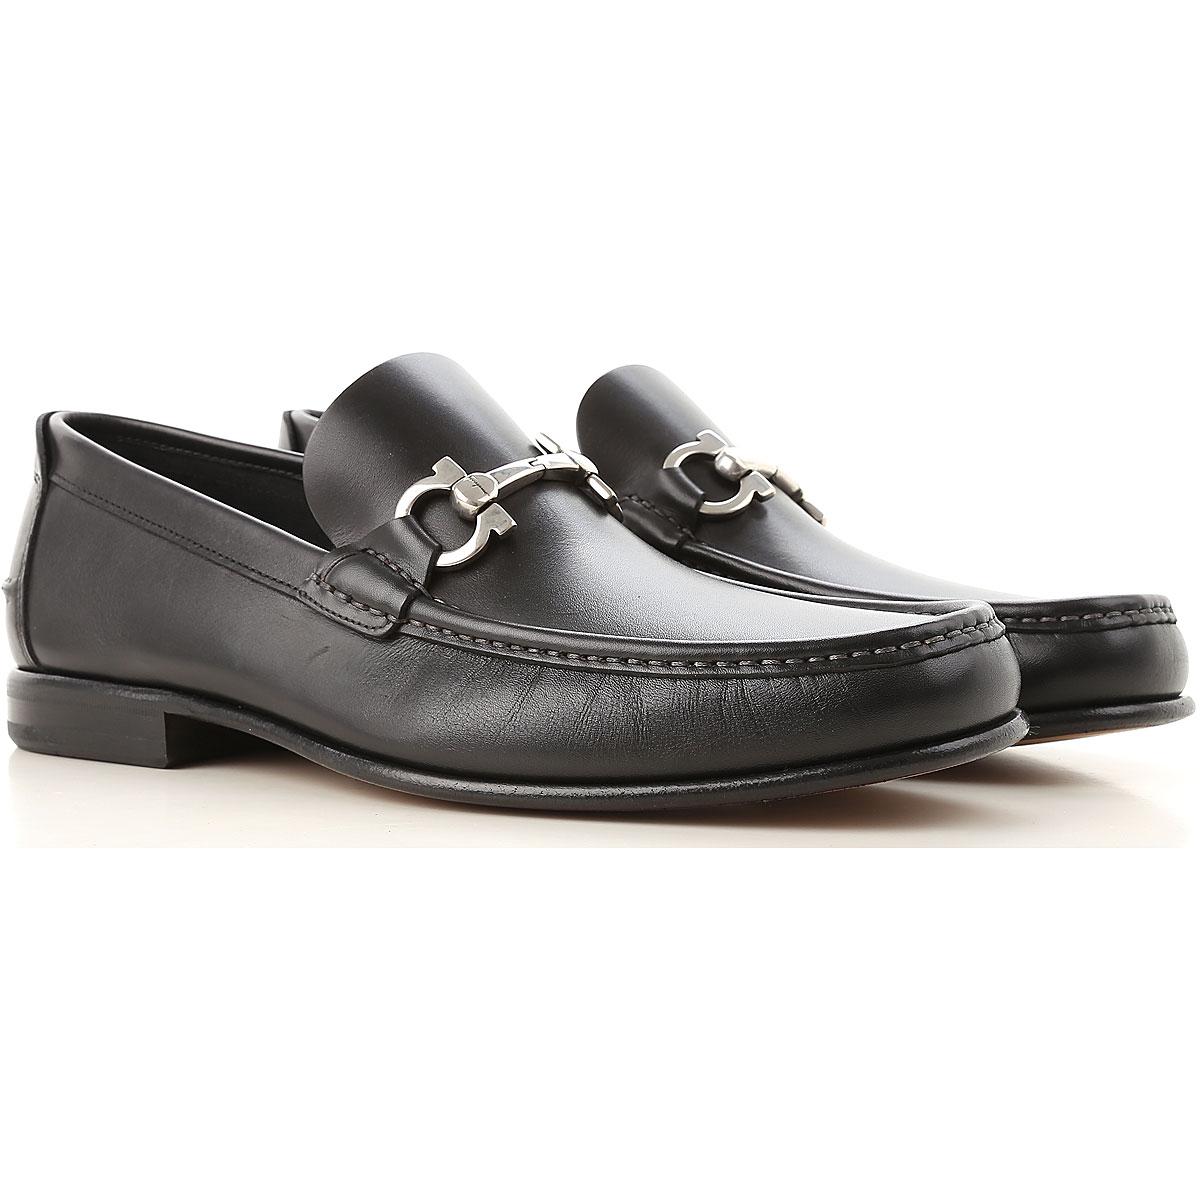 Image of Salvatore Ferragamo Loafers for Men, Black, Leather, 2017, 10 9 9.5